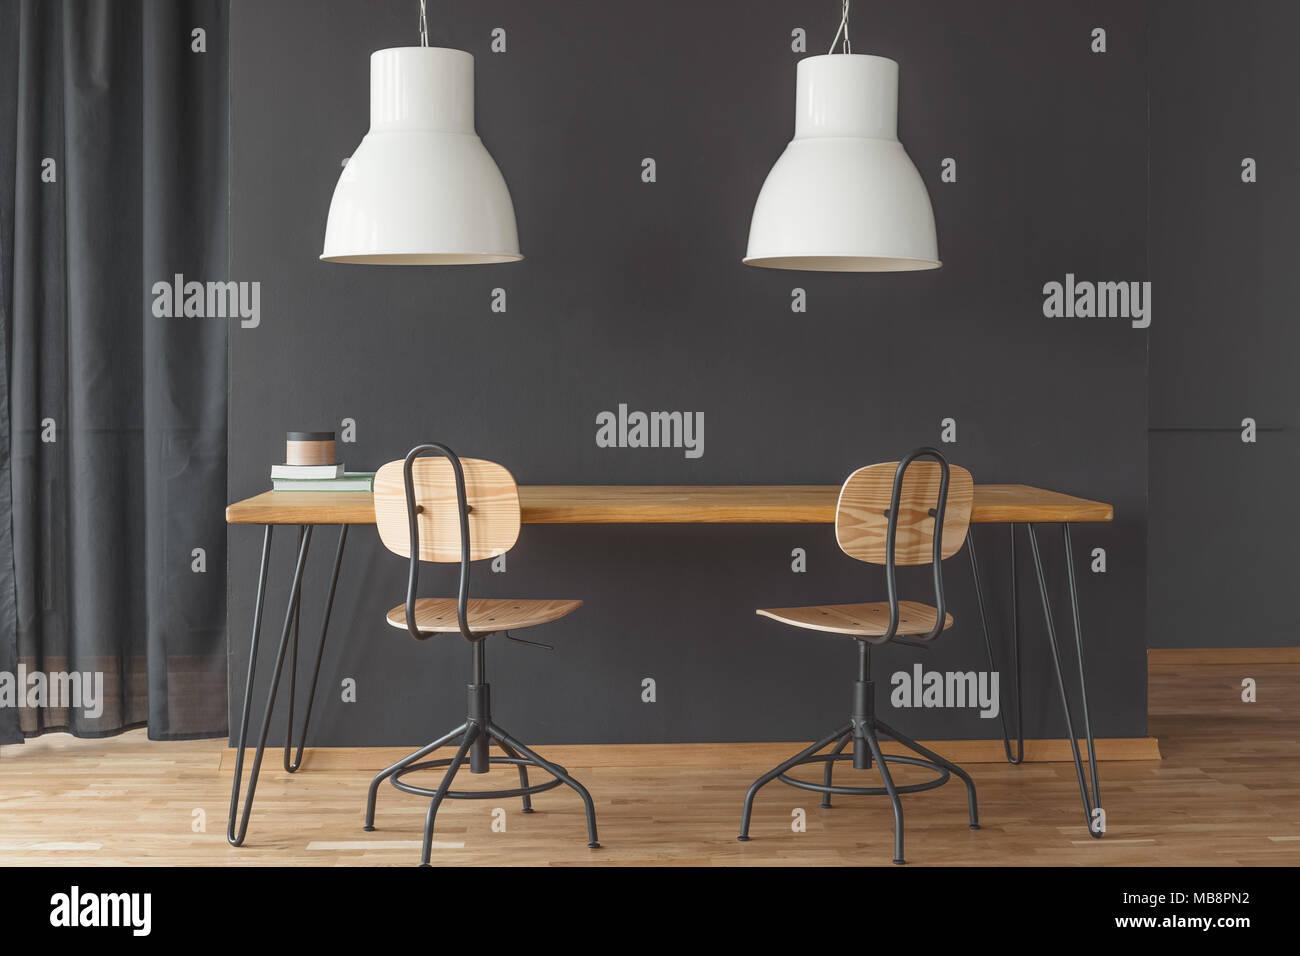 Zwei Weisse Lampen Aufhangen Oben Haarnadel Tabelle In Schwarz